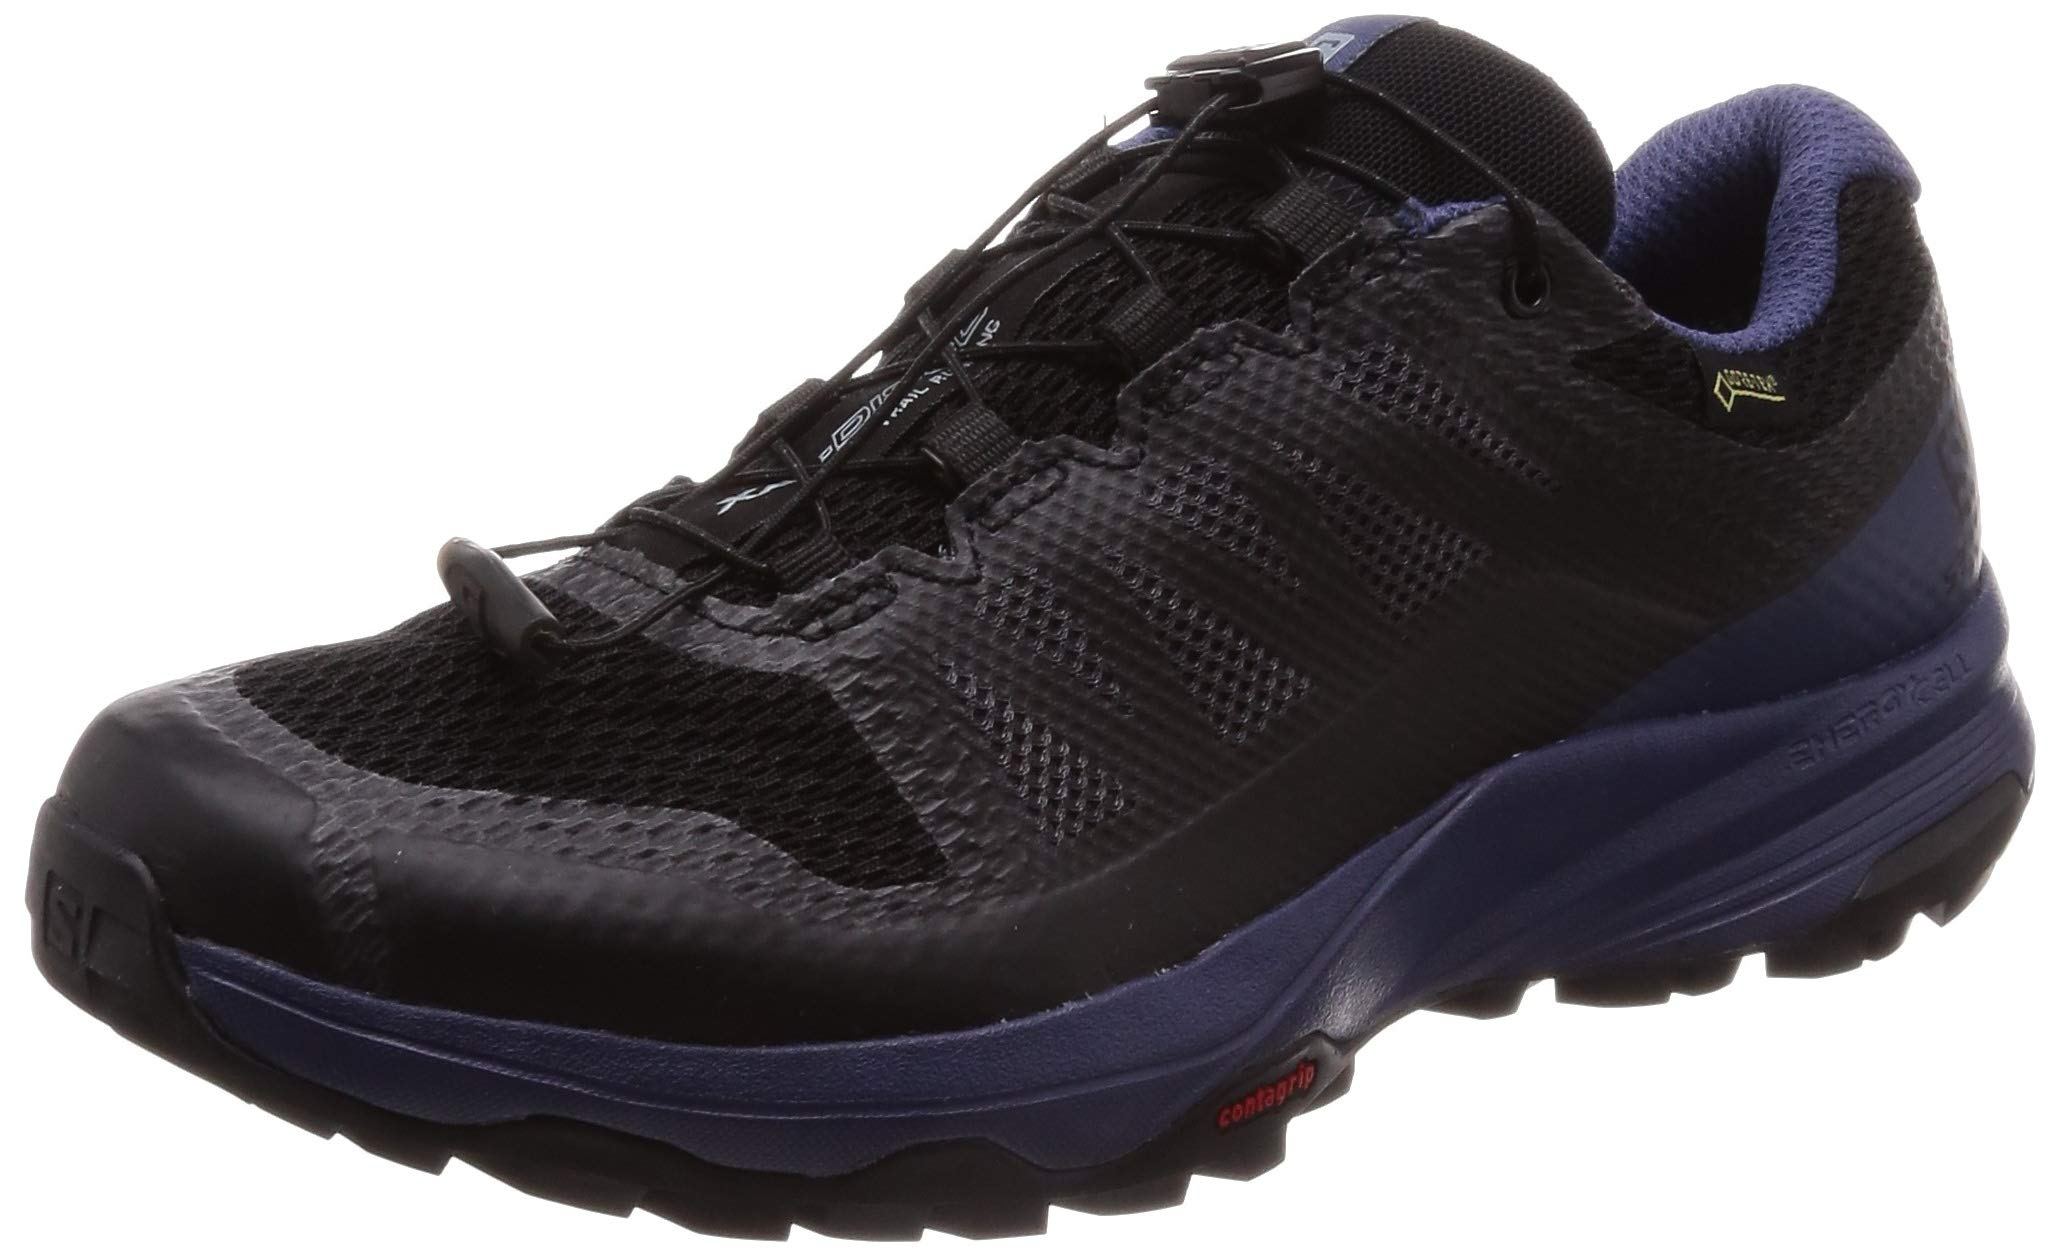 ebonyPointure43 Discovery Blue Chaussures De Gtx Trail Salomon 3 RunningXa crown 1 Femme WNoirblack 3q5AjL4R